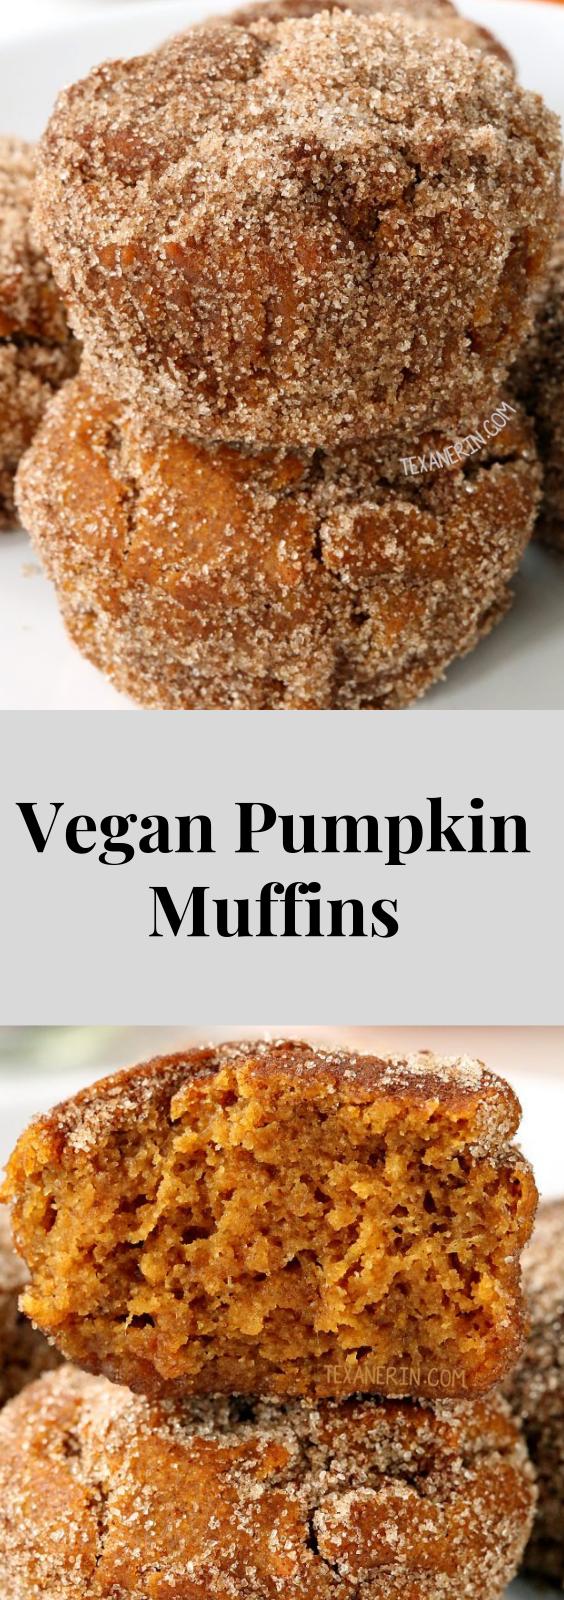 Vegan Pumpkin Muffins (gluten-free, whole wheat options) #pumpkinmuffins